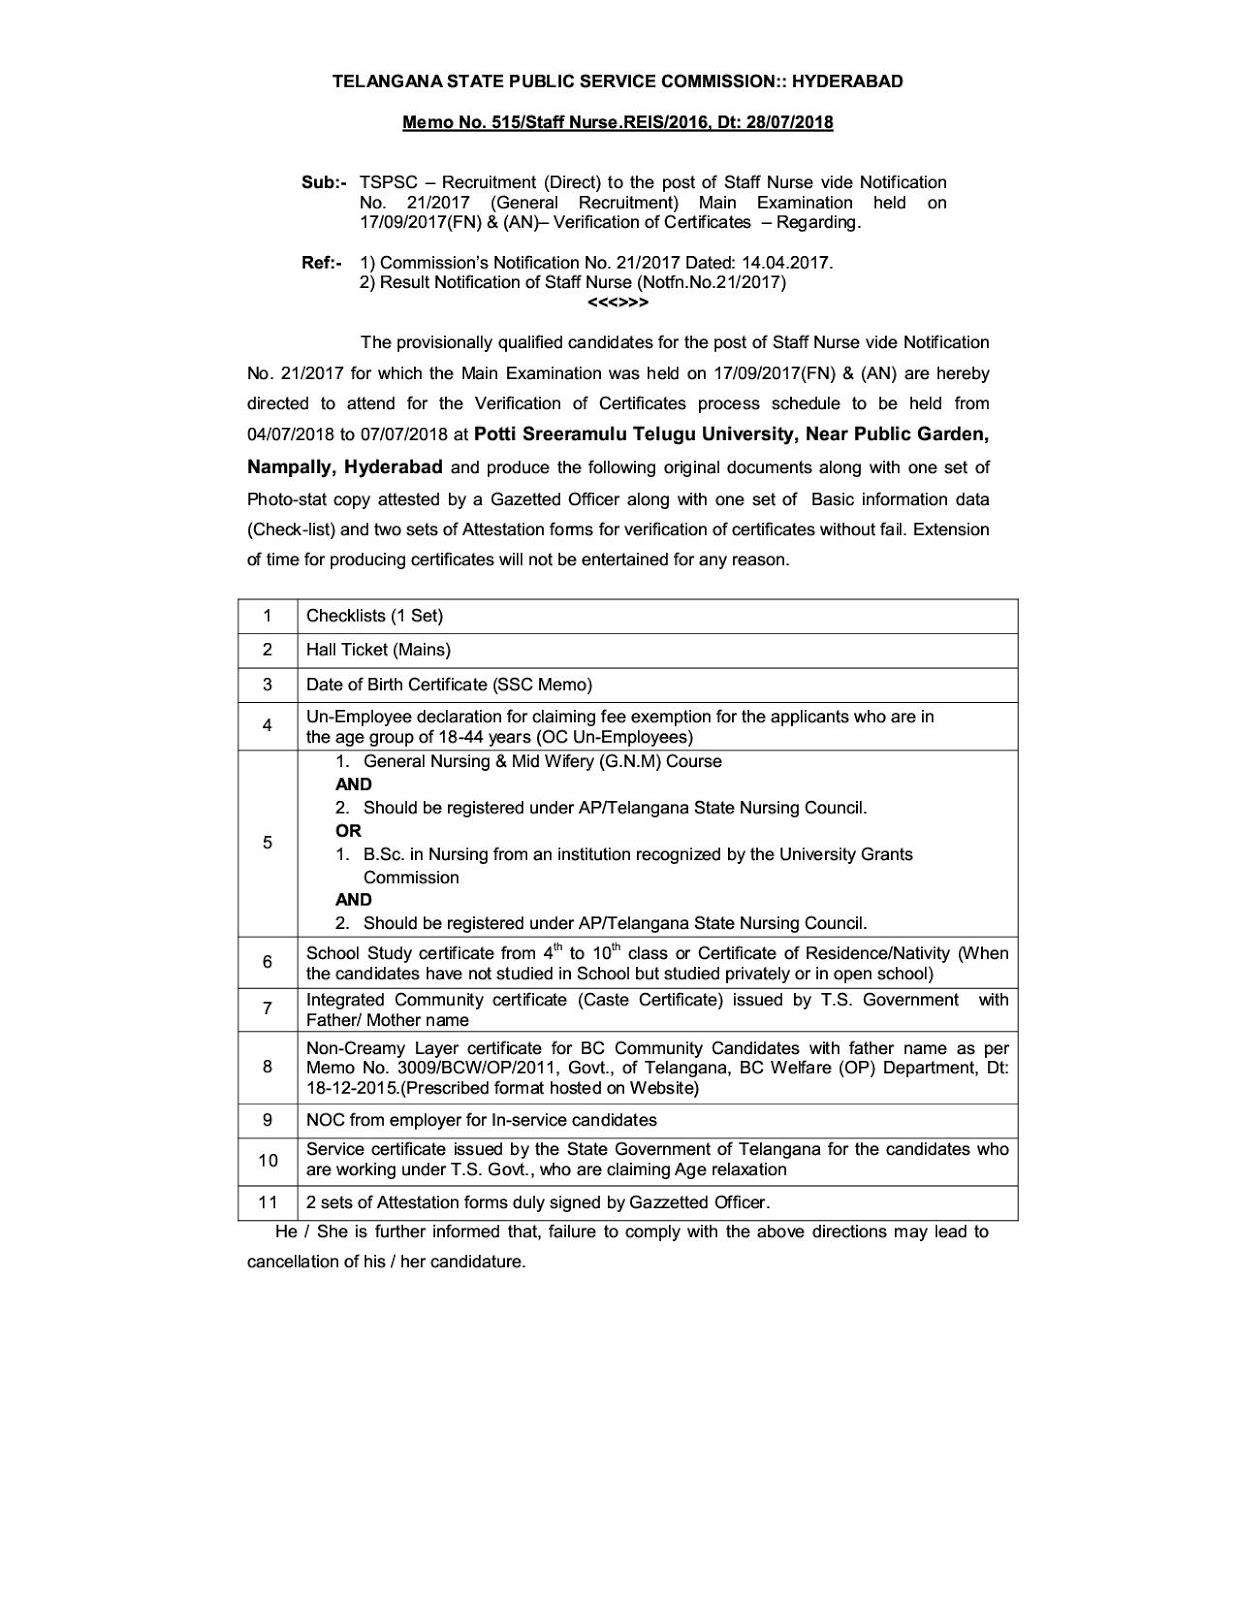 Telangana PSC Staff Nurse Document Verification Date and